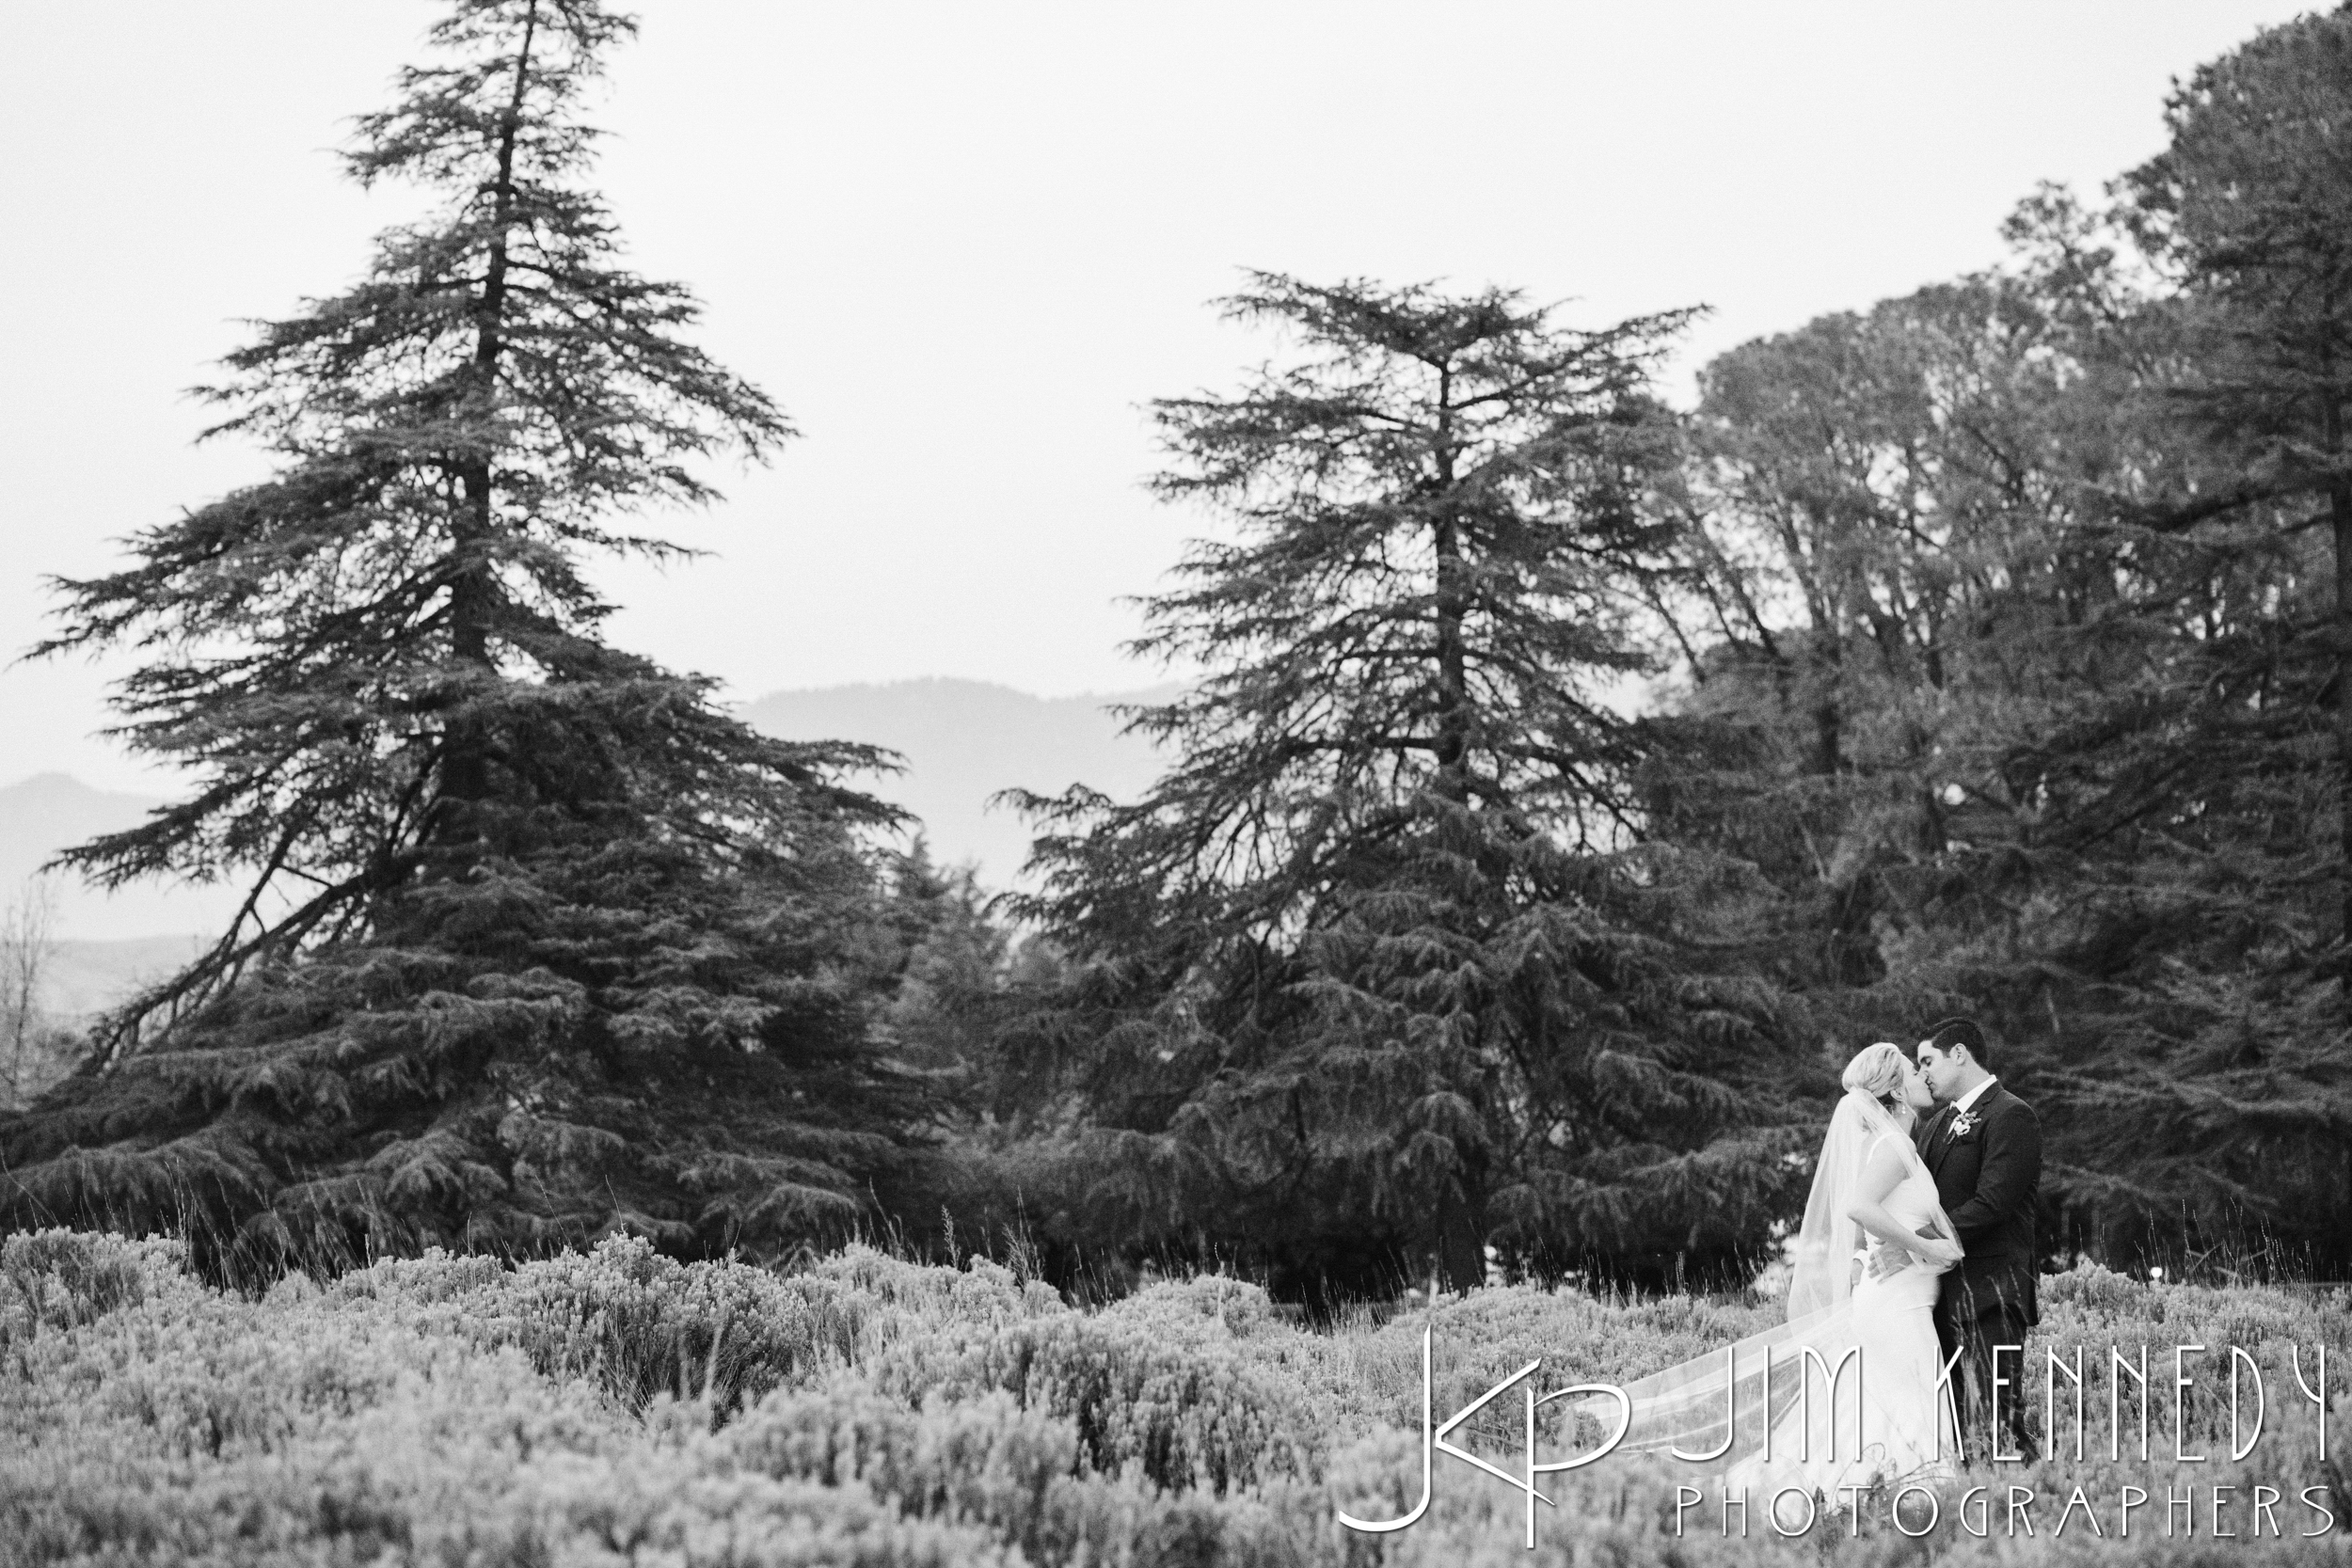 jim_kennedy_photographers_highland_springs_wedding_caitlyn_0160.jpg